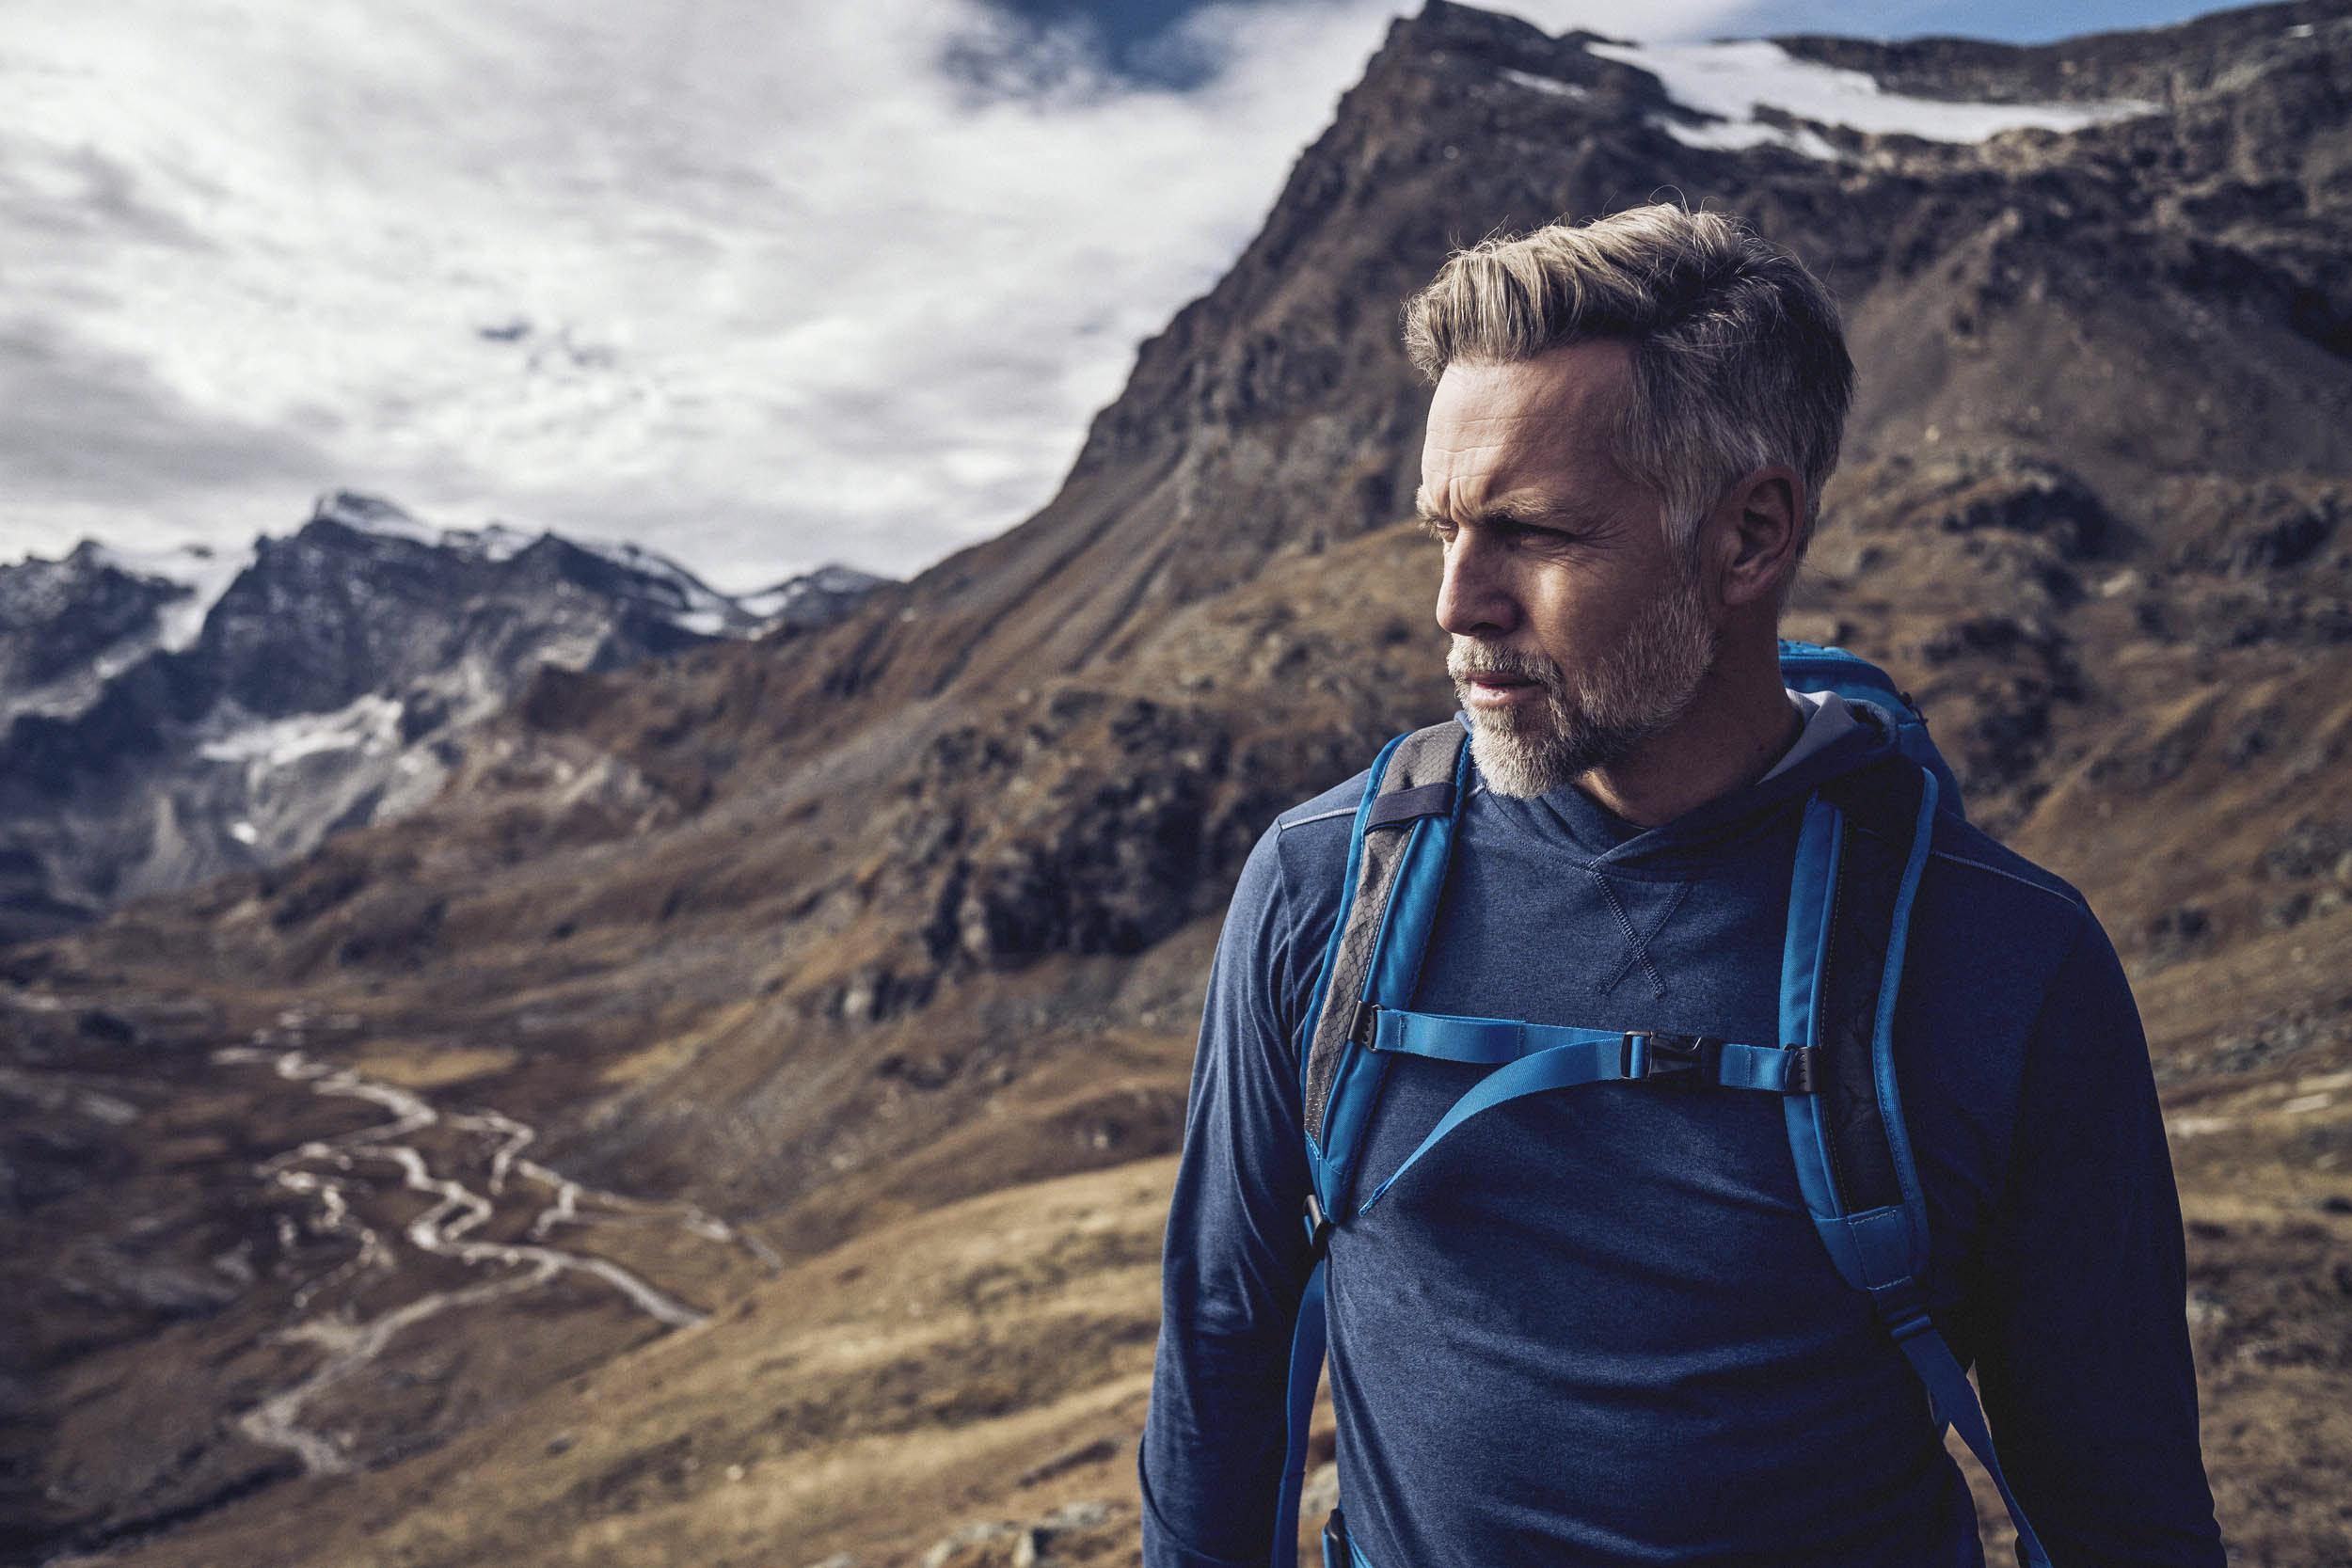 2019-SeifertUebler-luqel-outdoor-mountain-lifestyle012.jpg